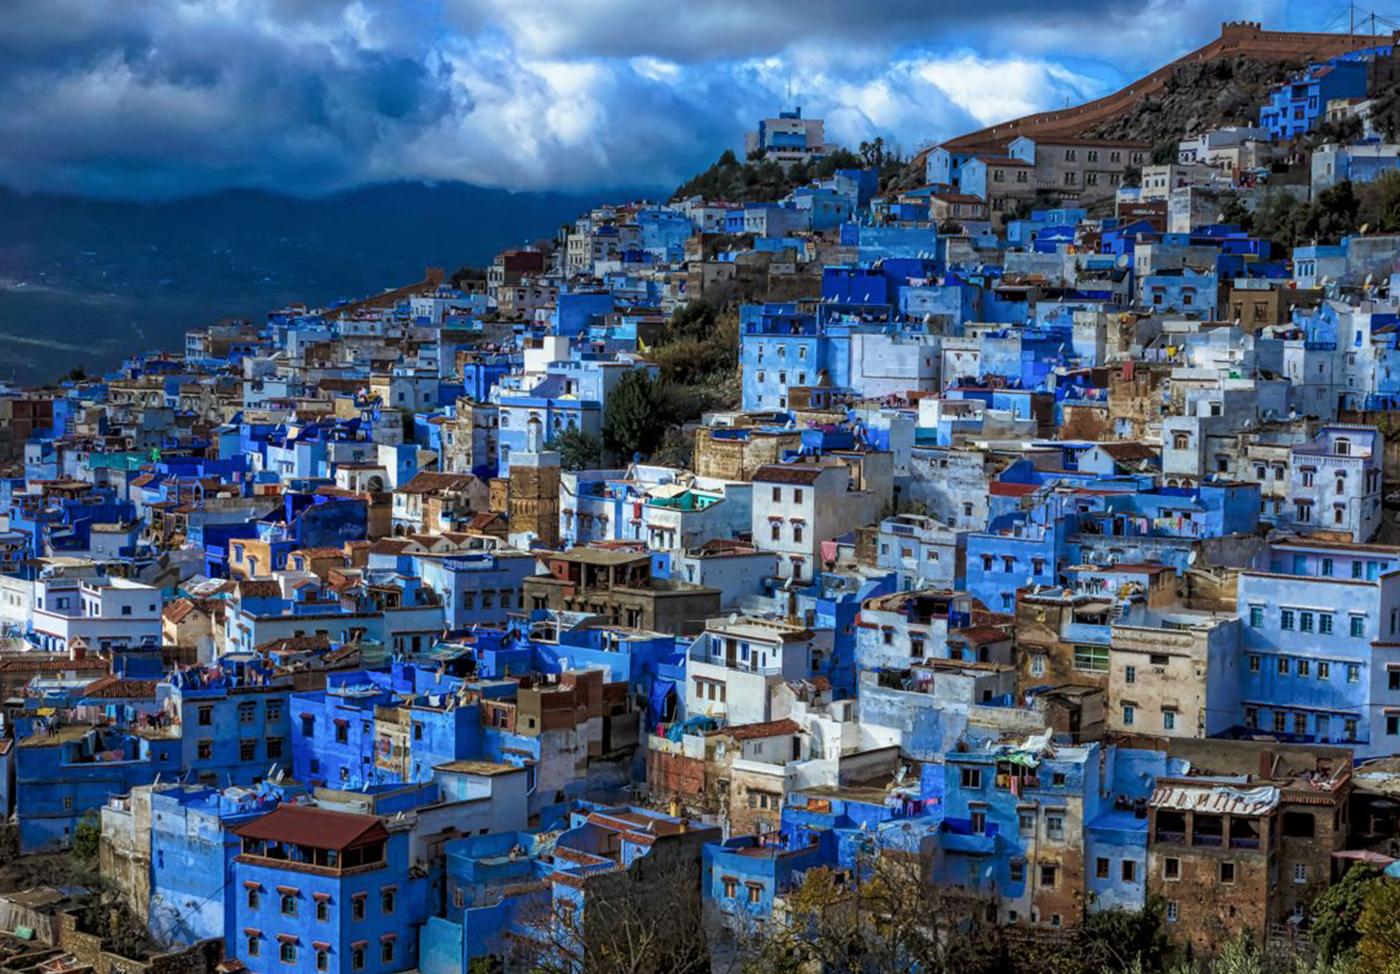 Chefchaouen-Marocco-IMG-4-TESTO